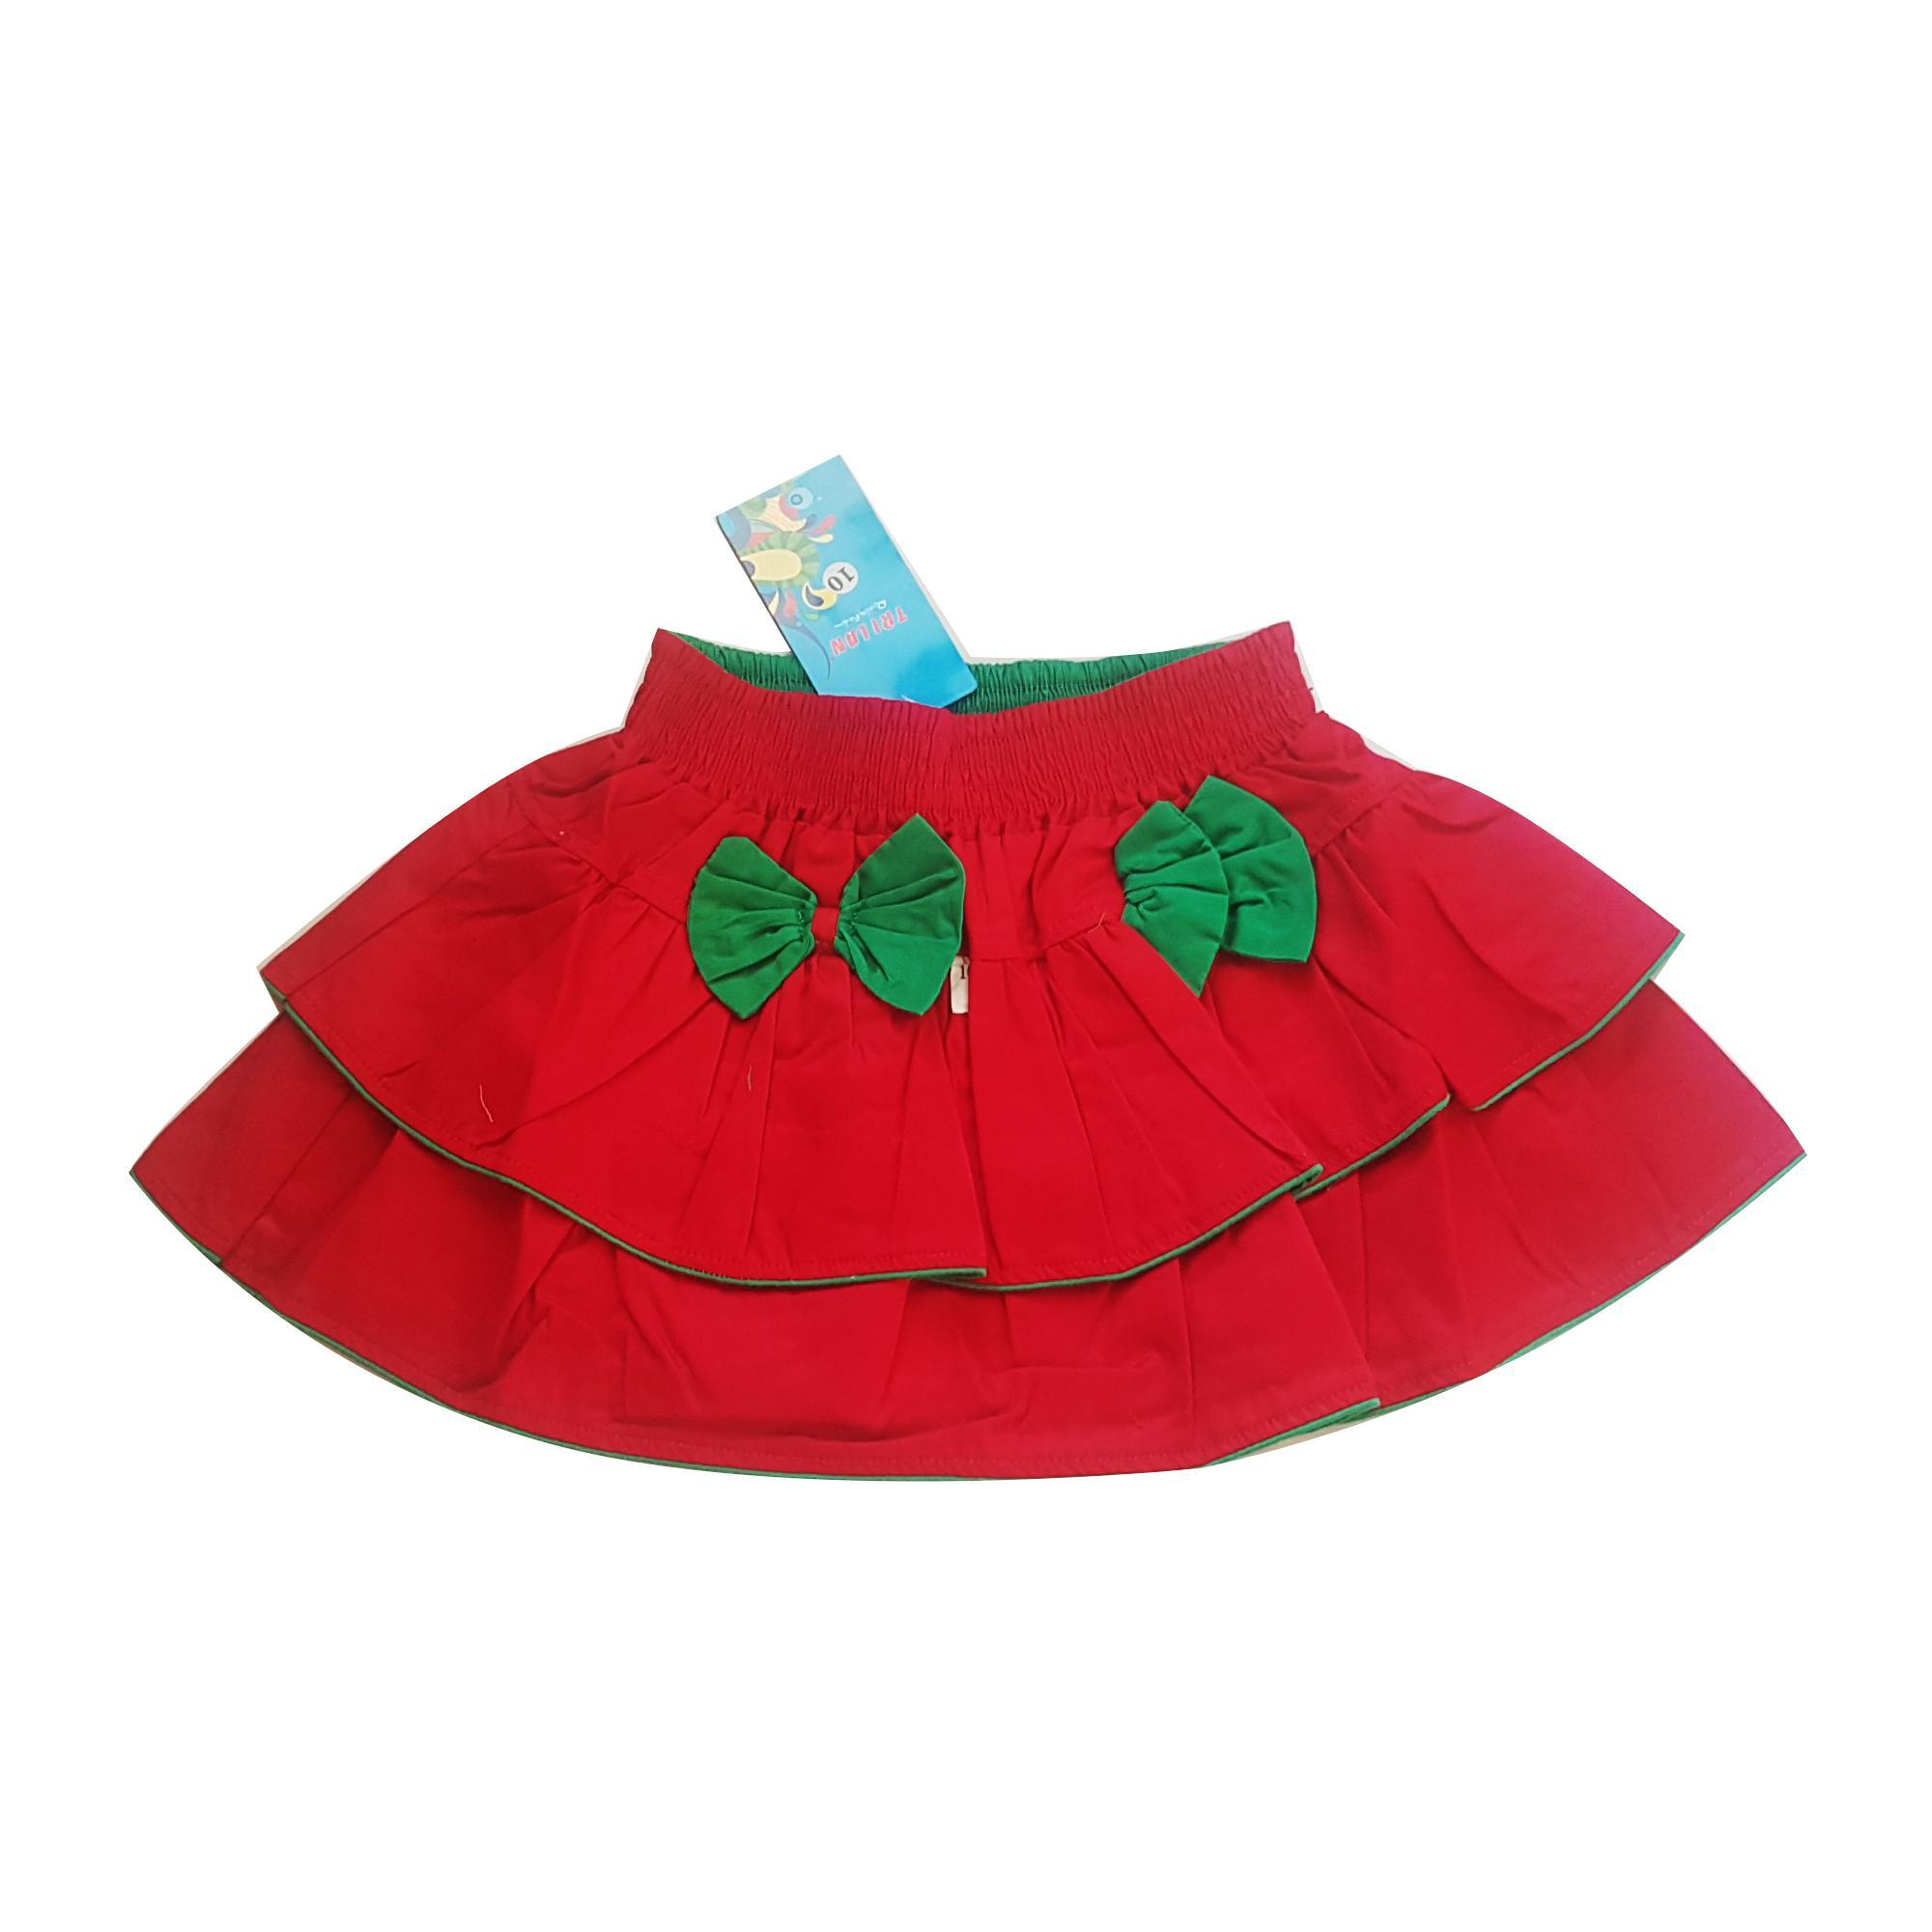 Váy xòe bé gái 5-12 tuổi Tri Lan VBG004